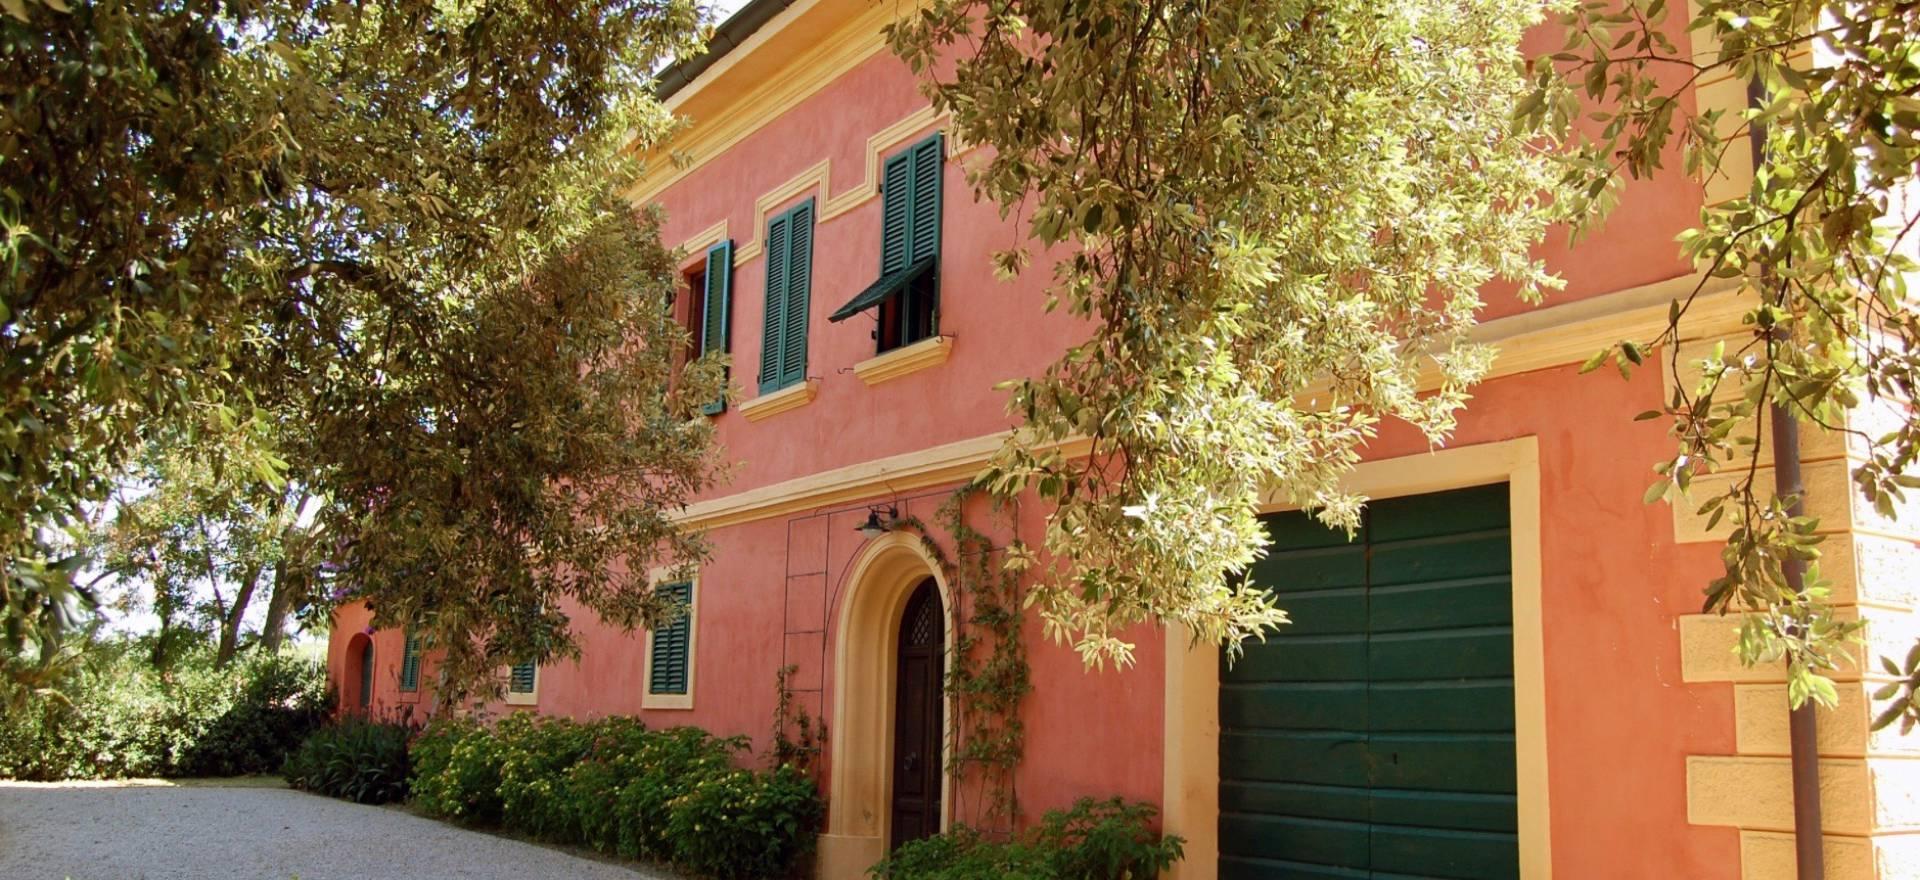 Agriturismo Toscane Rustige olijfolie agriturismo nabij Toscaanse kust